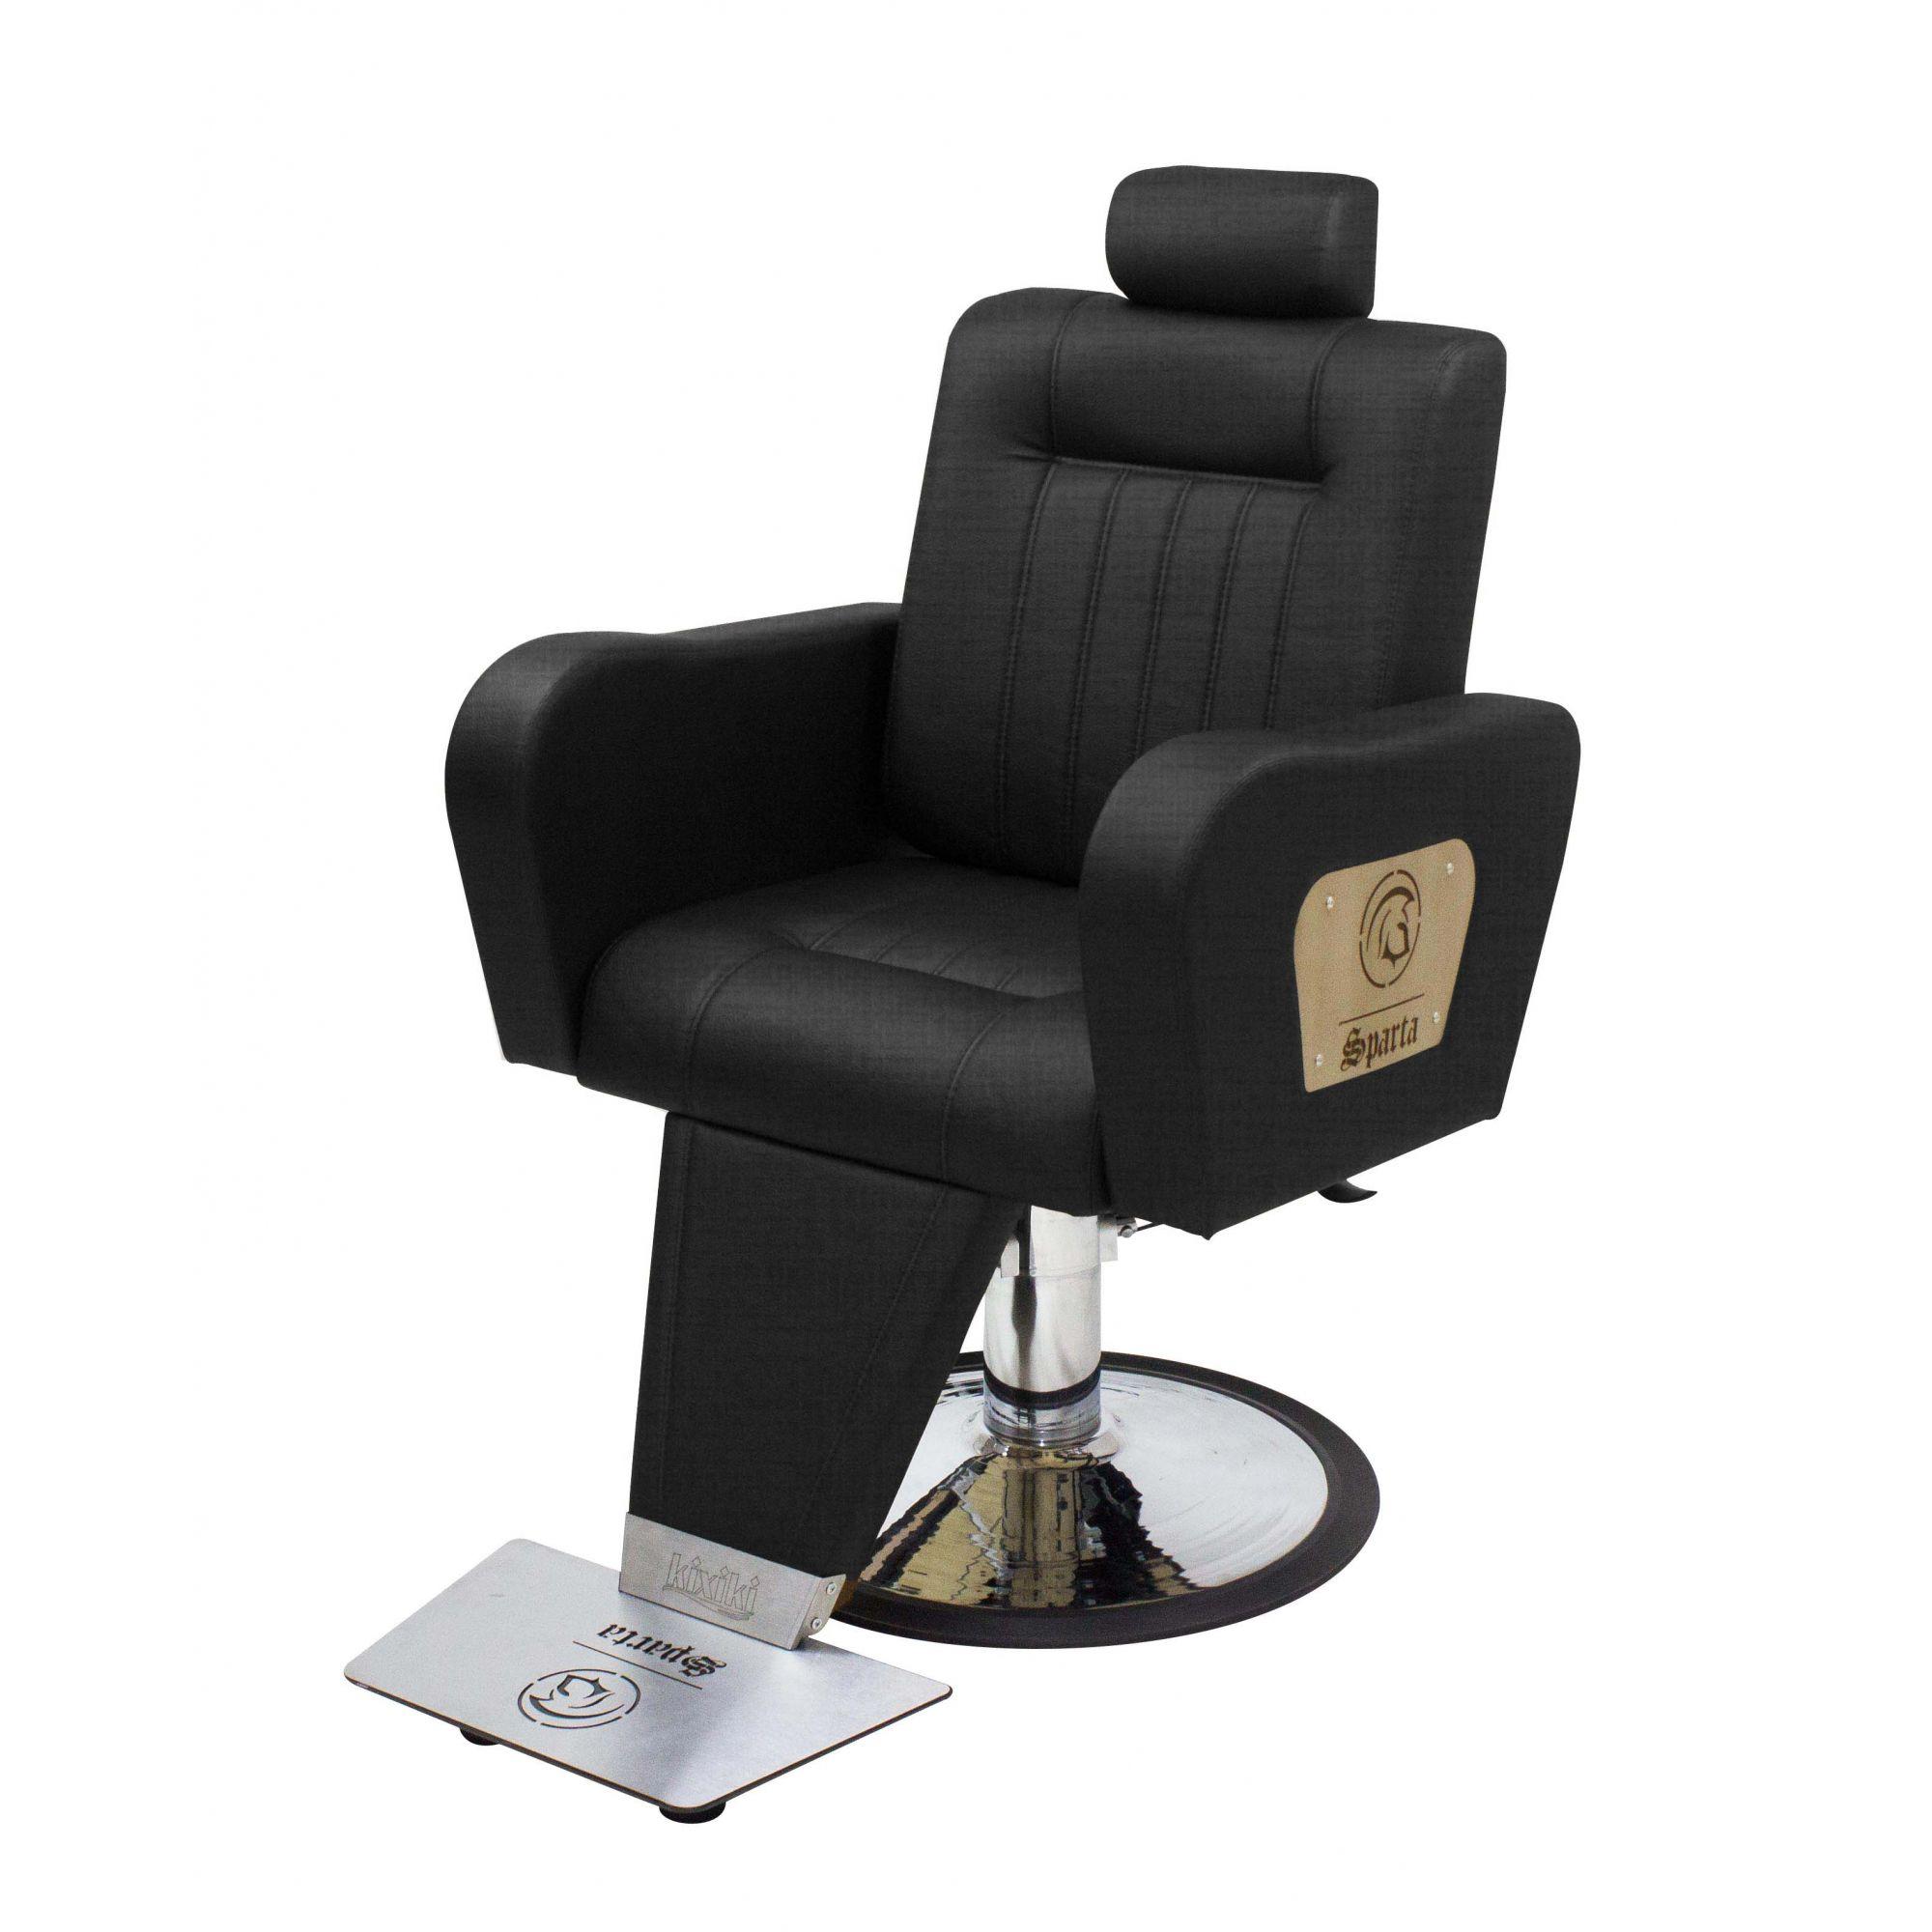 Poltrona Cadeira Kixiki Sparta Reclinável Para Barbeiro Preto